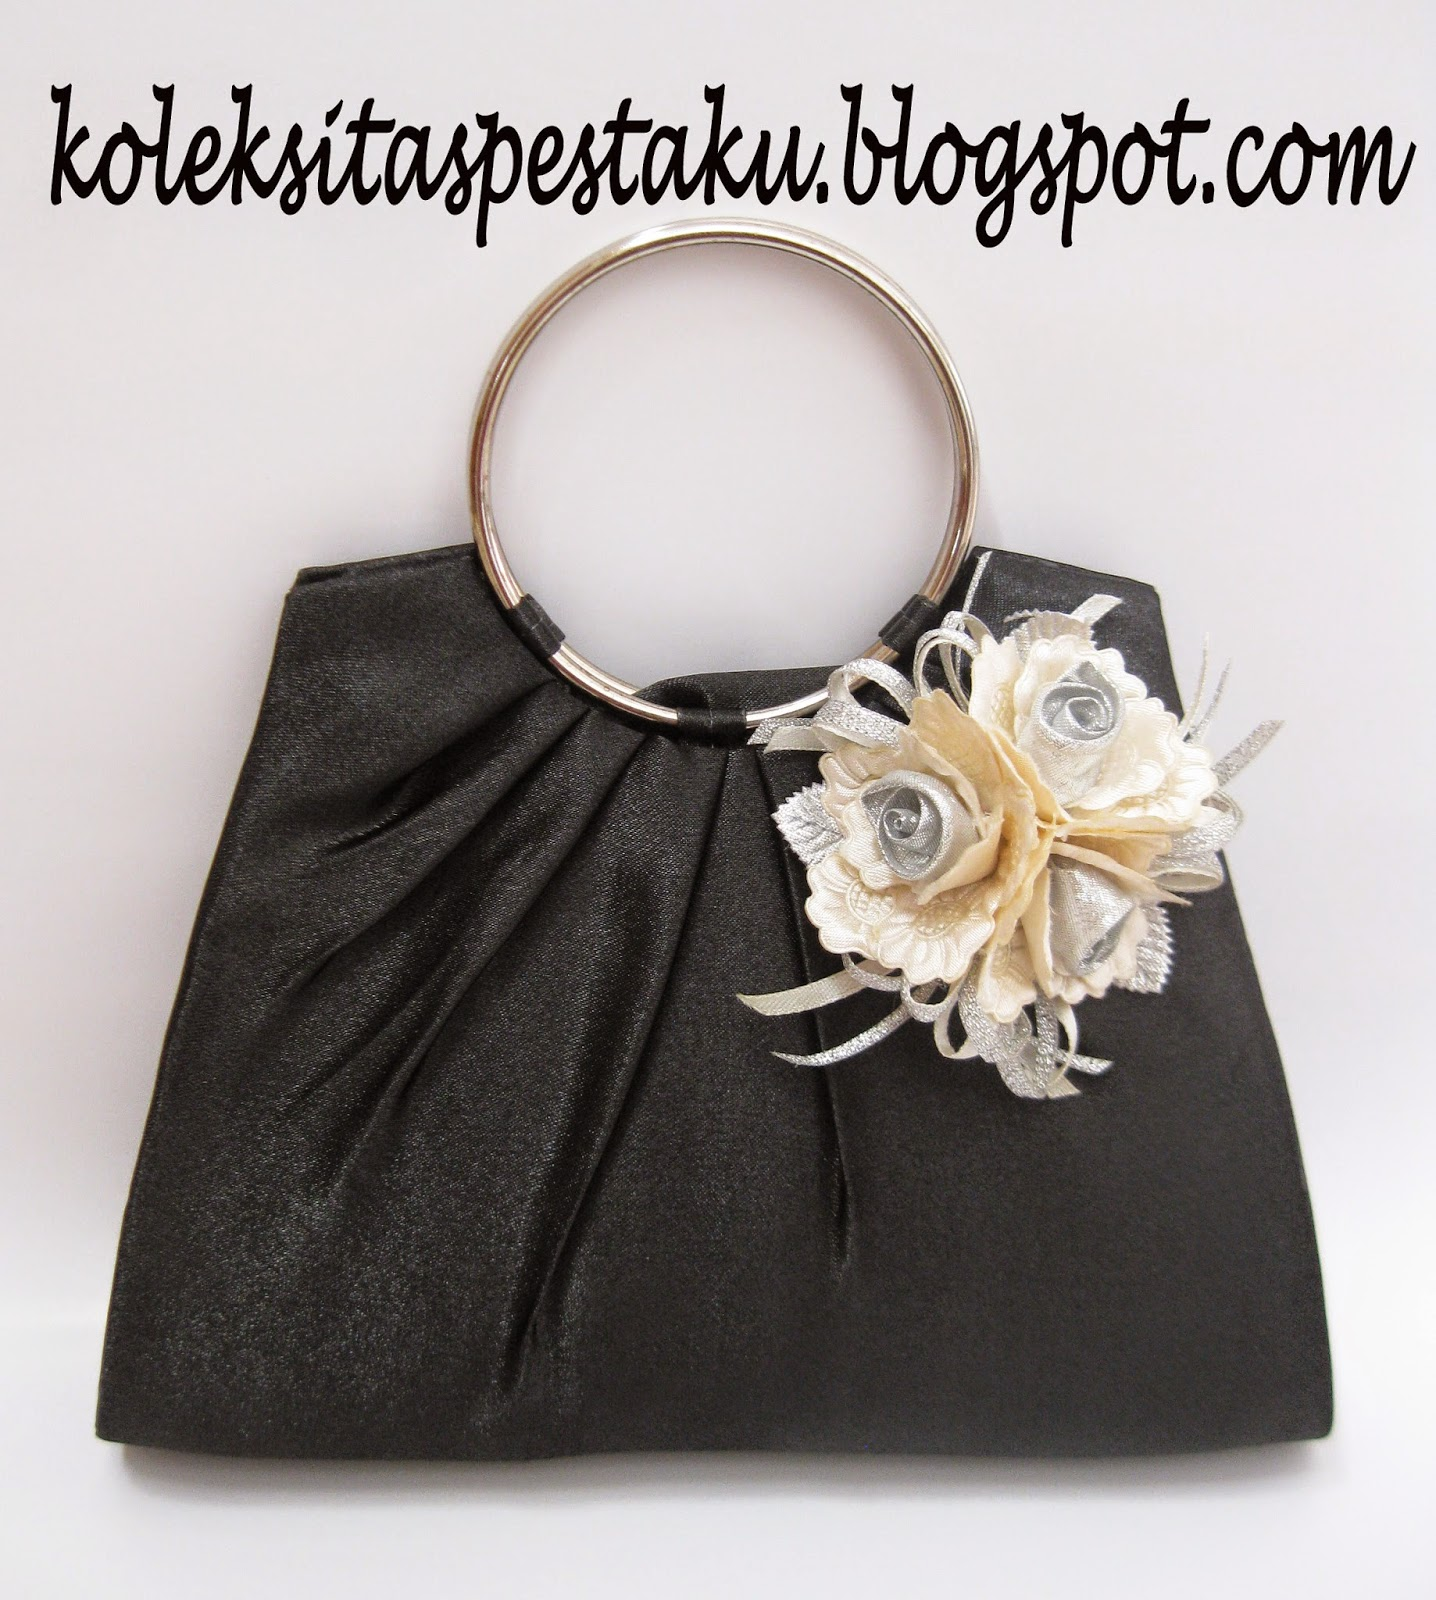 Tas Pesta - Clutch Bag  taspestaku  Online SHop Koleksi Tas Pesta Ku ... f6d91a73fe